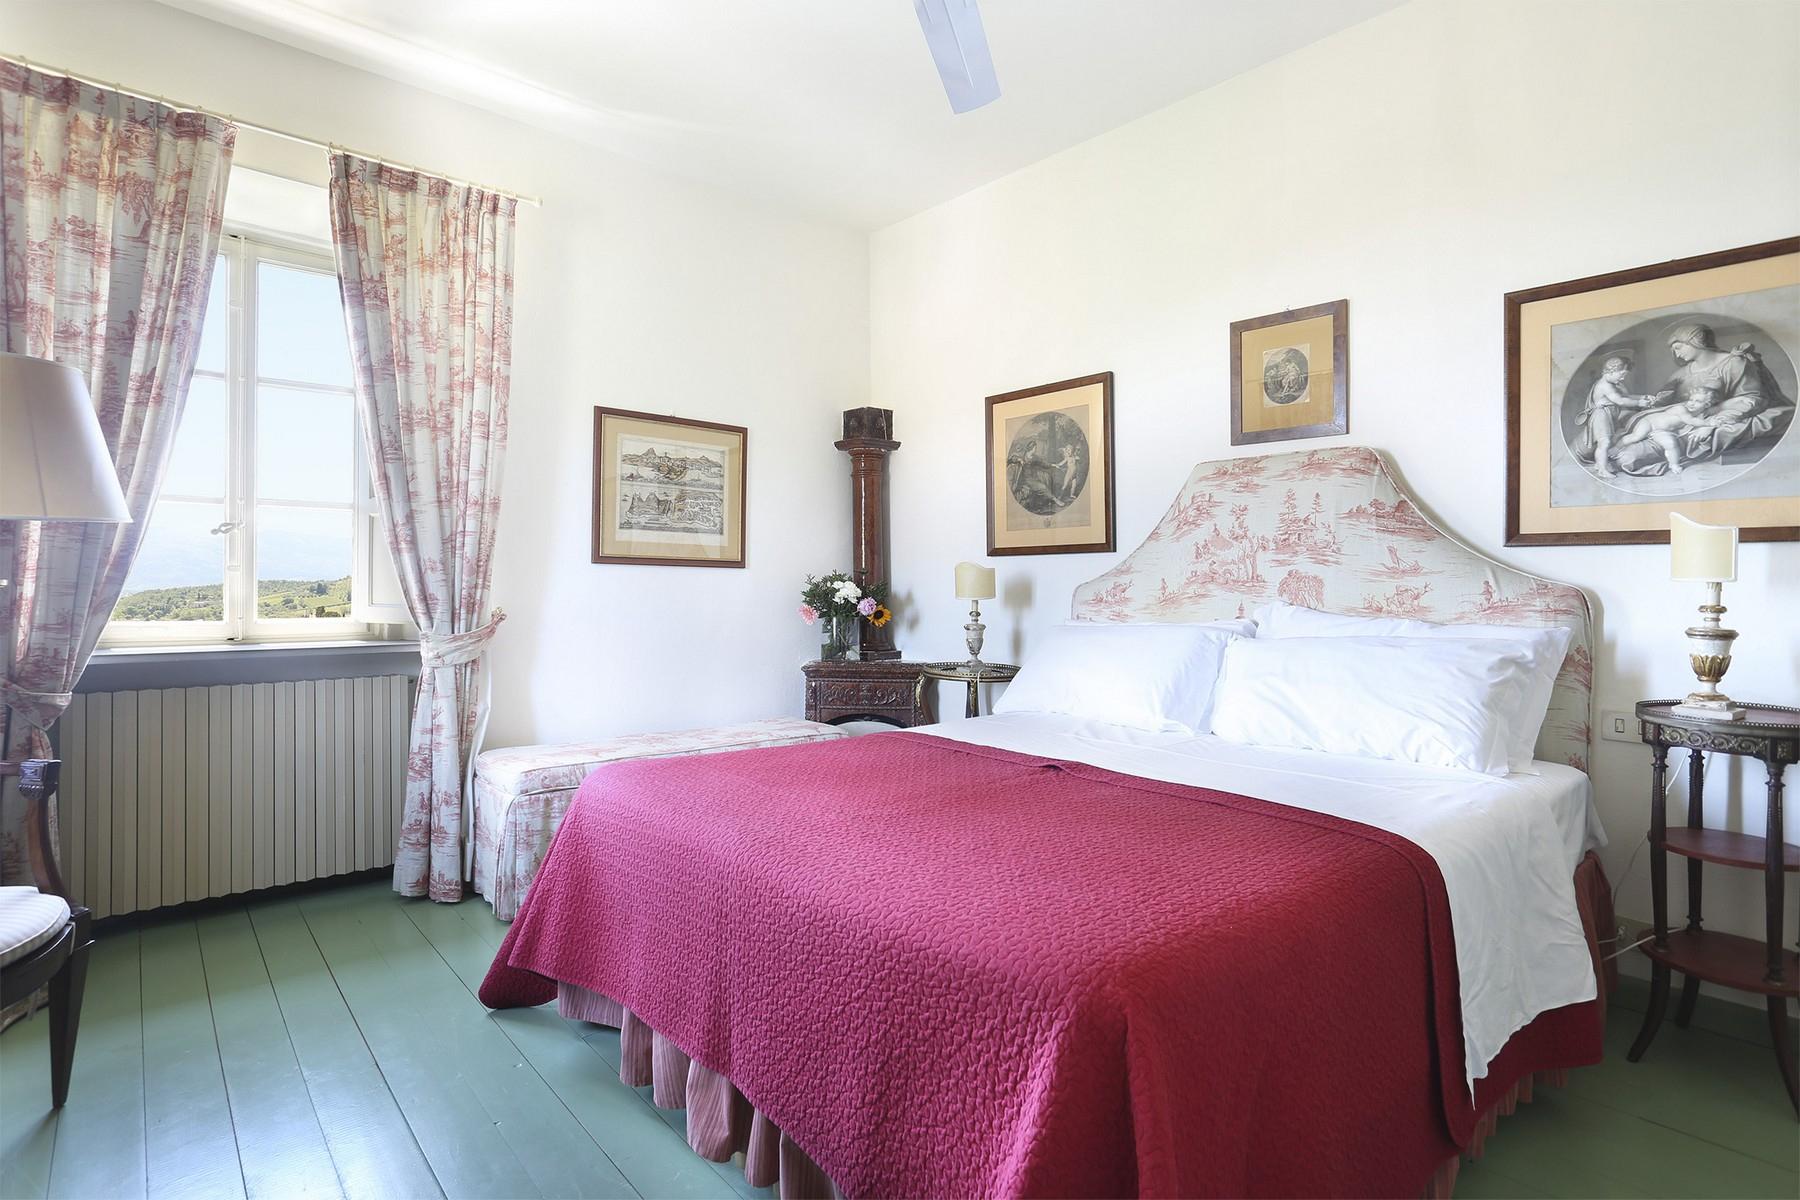 Villa in Vendita a Lucca: 5 locali, 735 mq - Foto 16